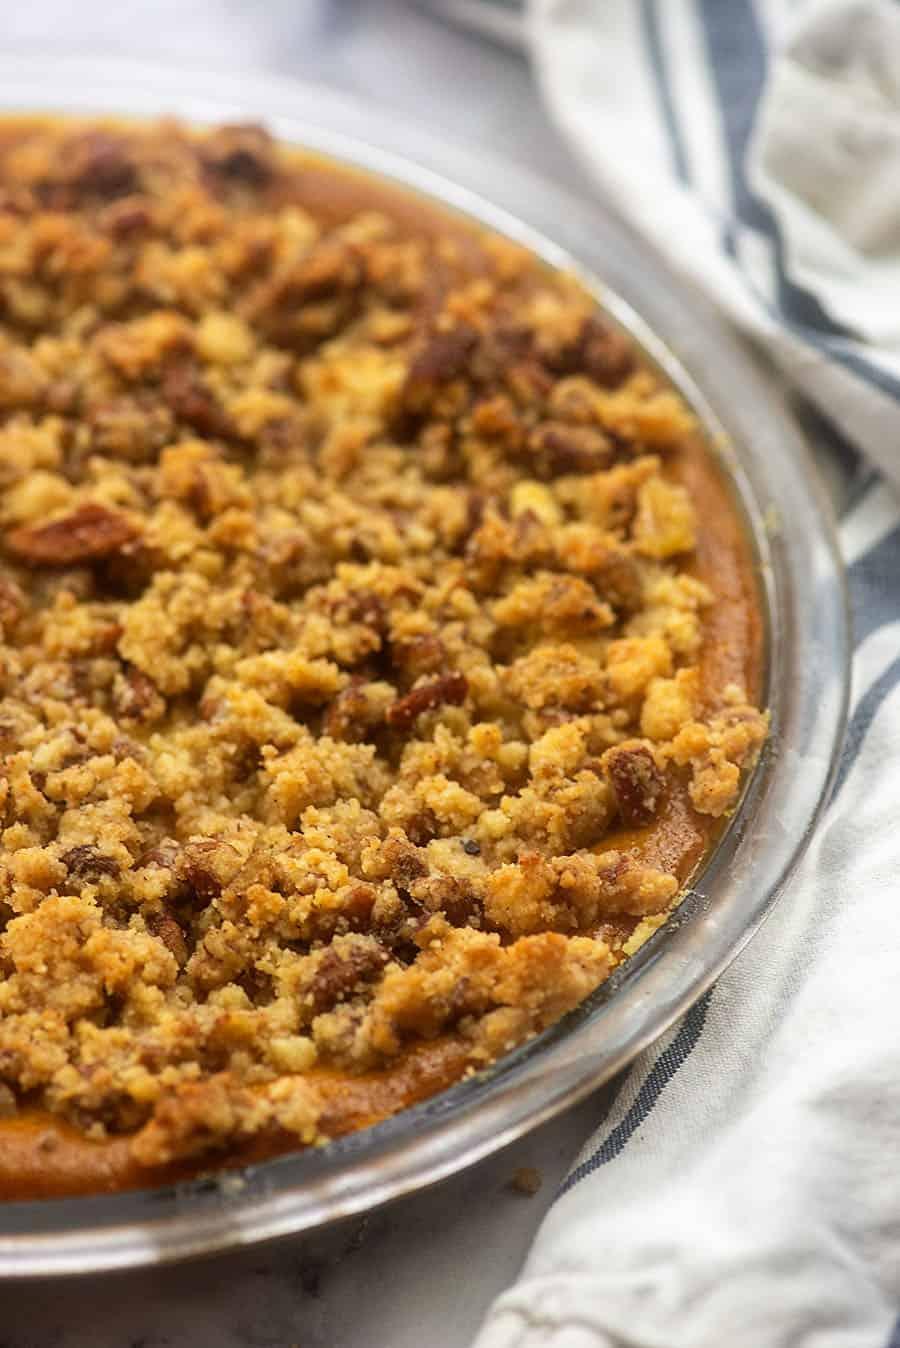 Streusel topped crustless pumpkin pie